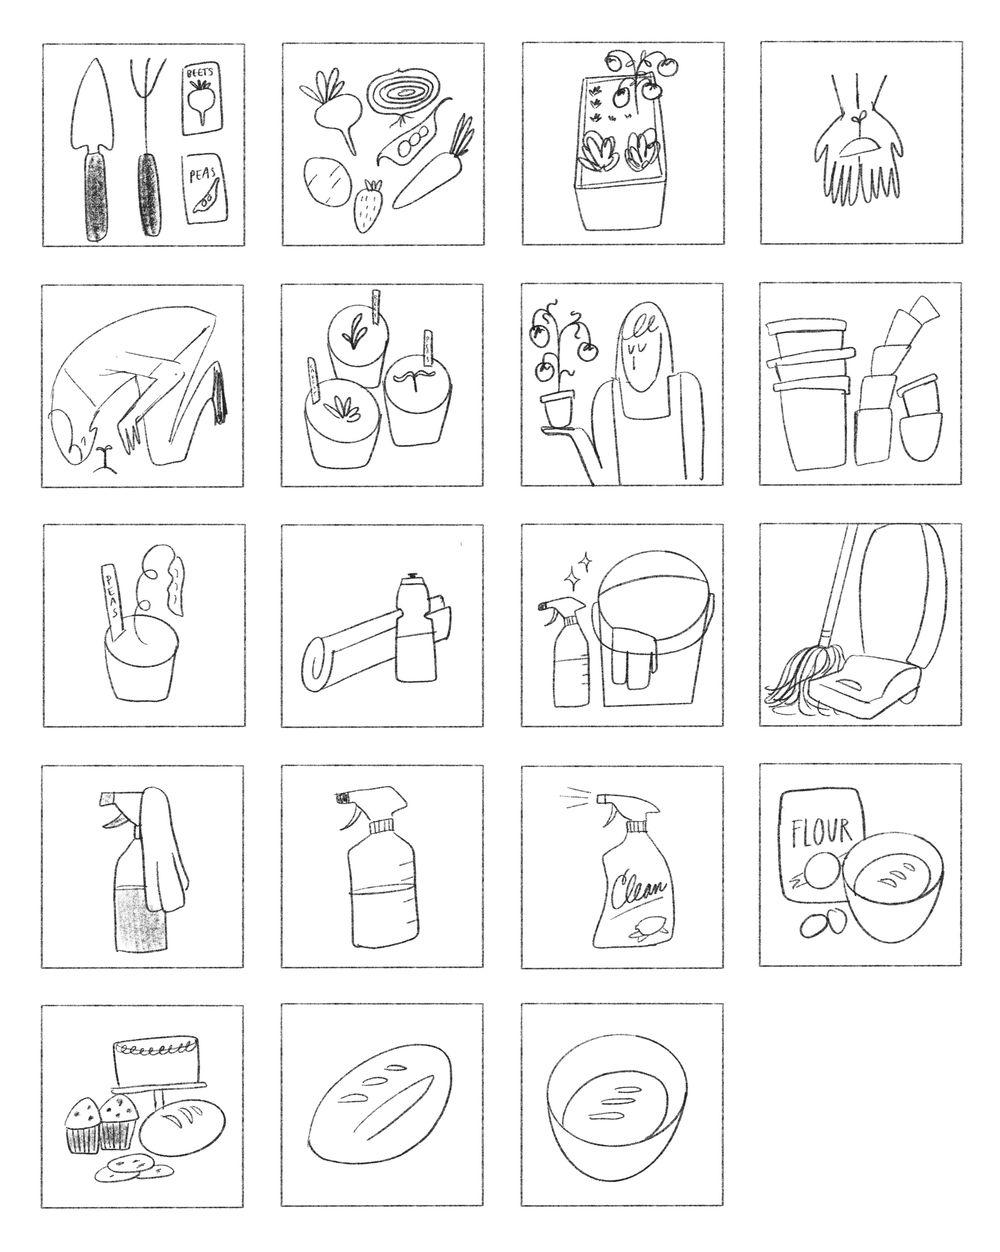 Procrastination - image 1 - student project